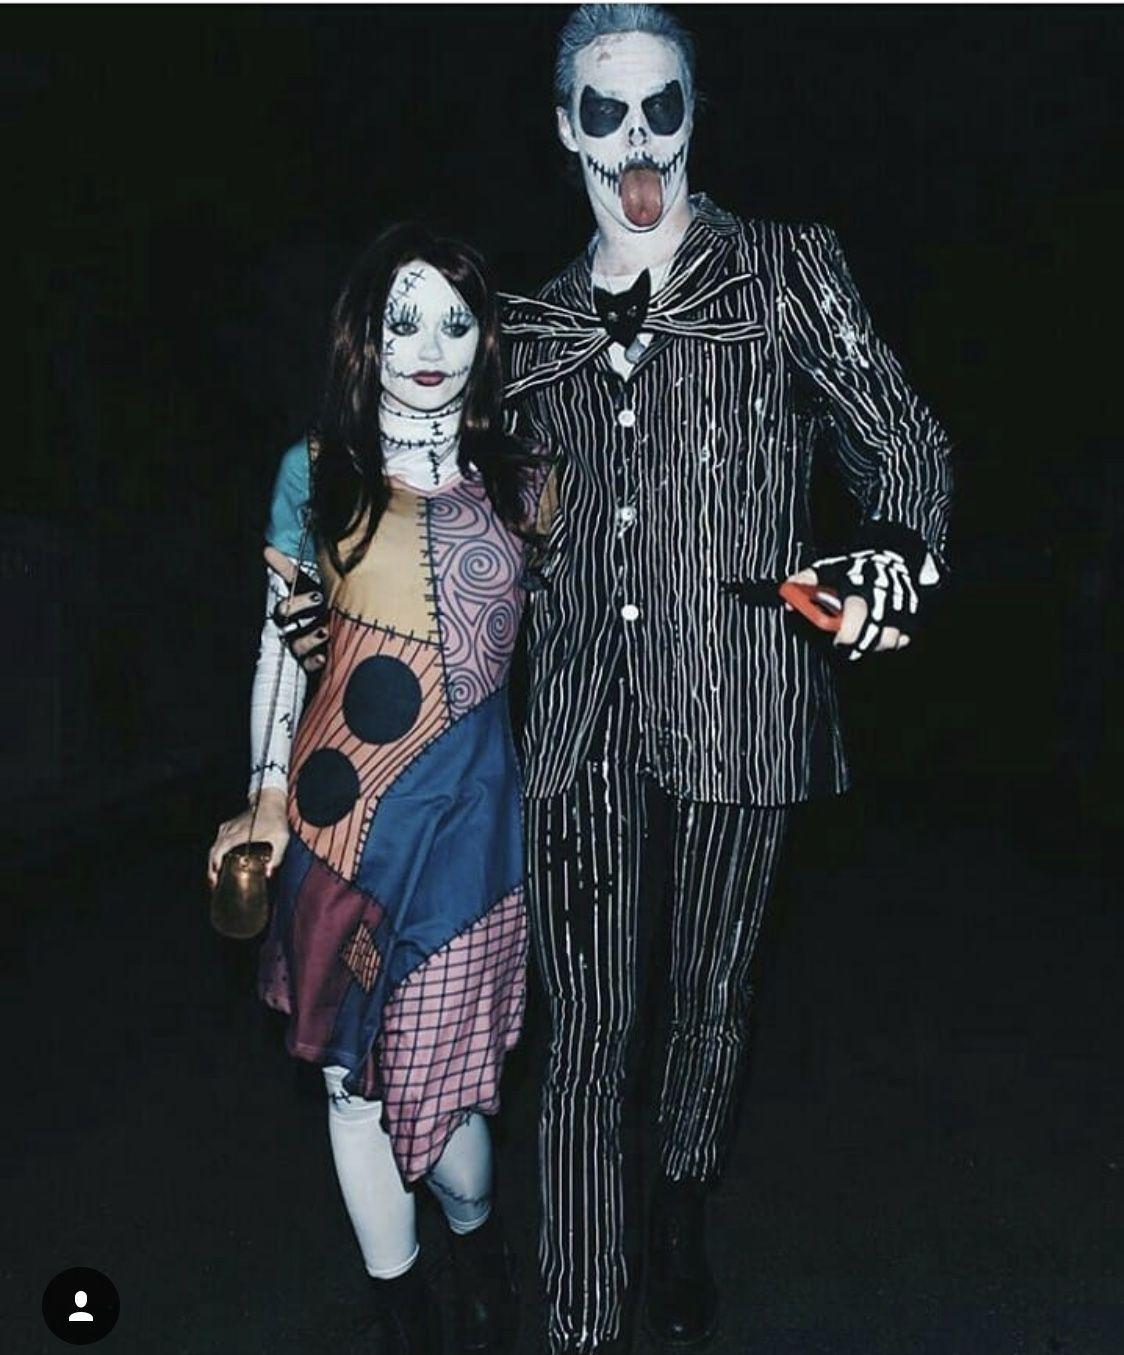 Halloween Tim Burton Austin Party 2020 Pin by Cassandra Aguilar on JOEY ELORDI☺️ | Tim burton halloween